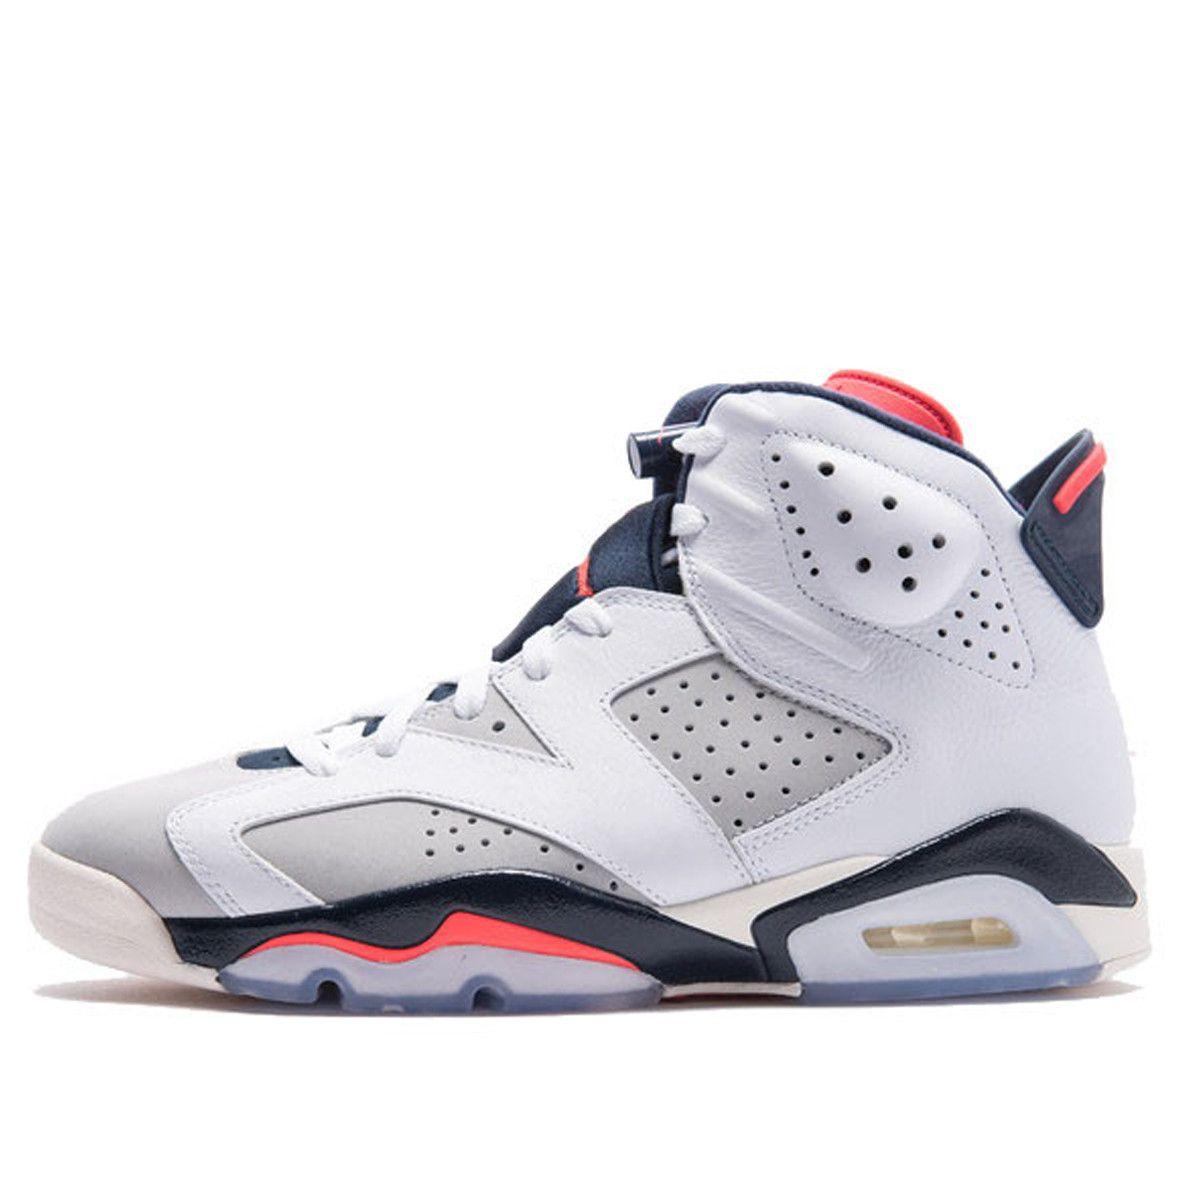 la meilleure attitude c0757 26ef9 Bonnets Nike AIR JORDAN RETRO 6 - Pegashoes